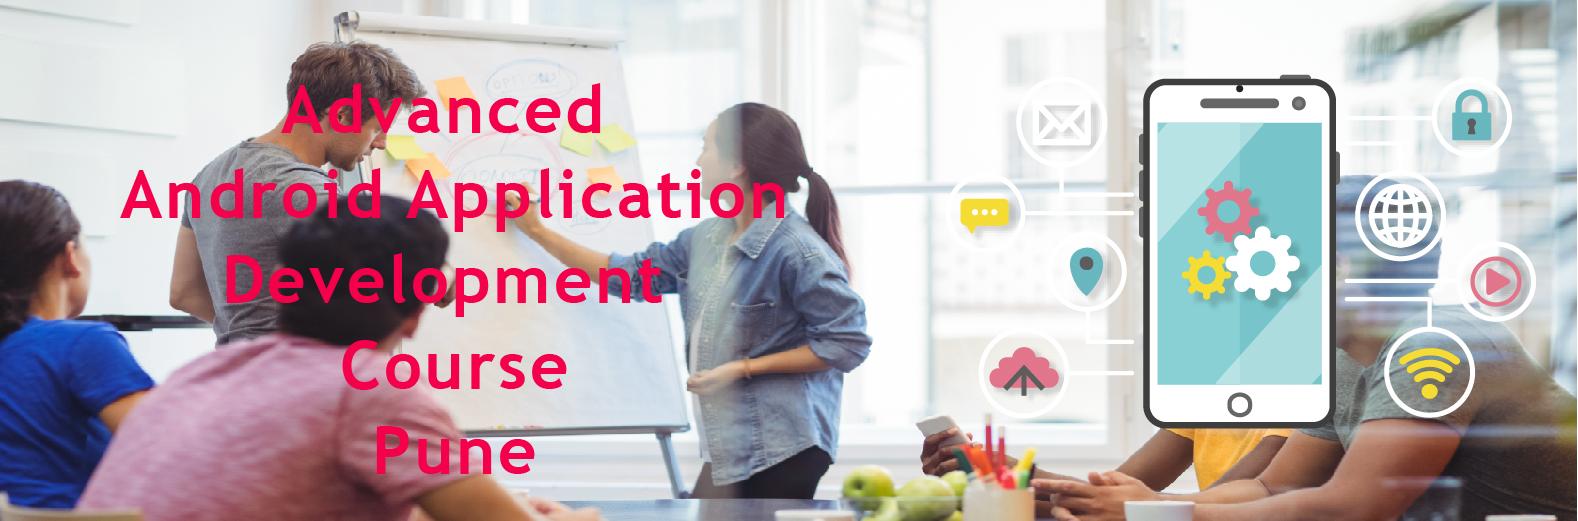 Advanced Android App Development course Pune